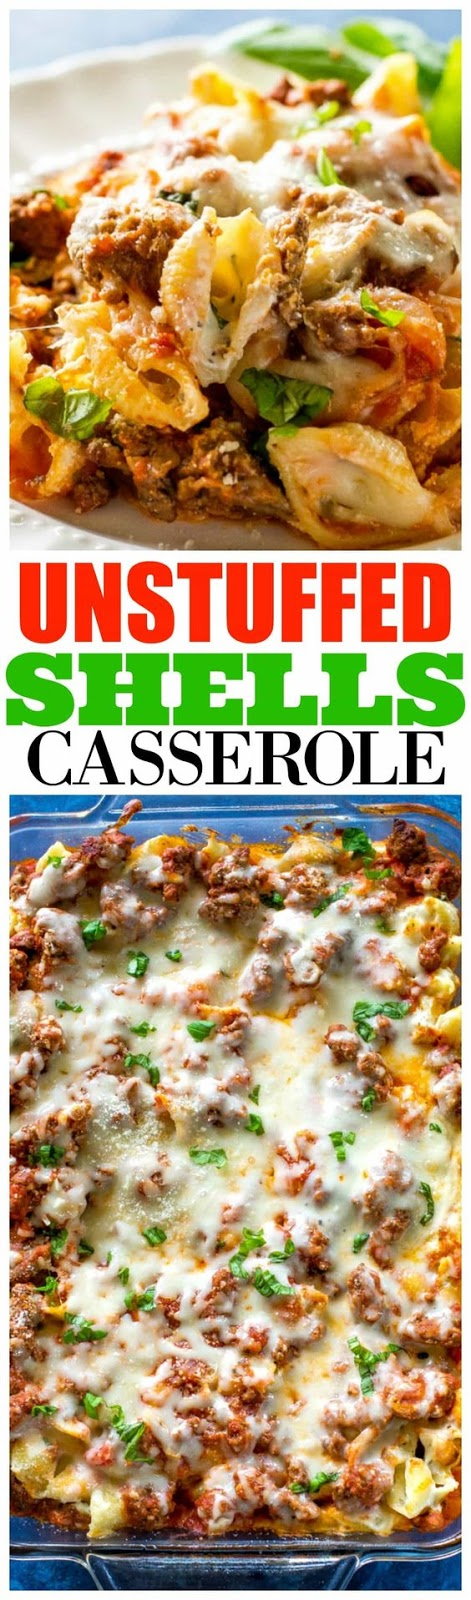 Unstuffed Shells Casserole